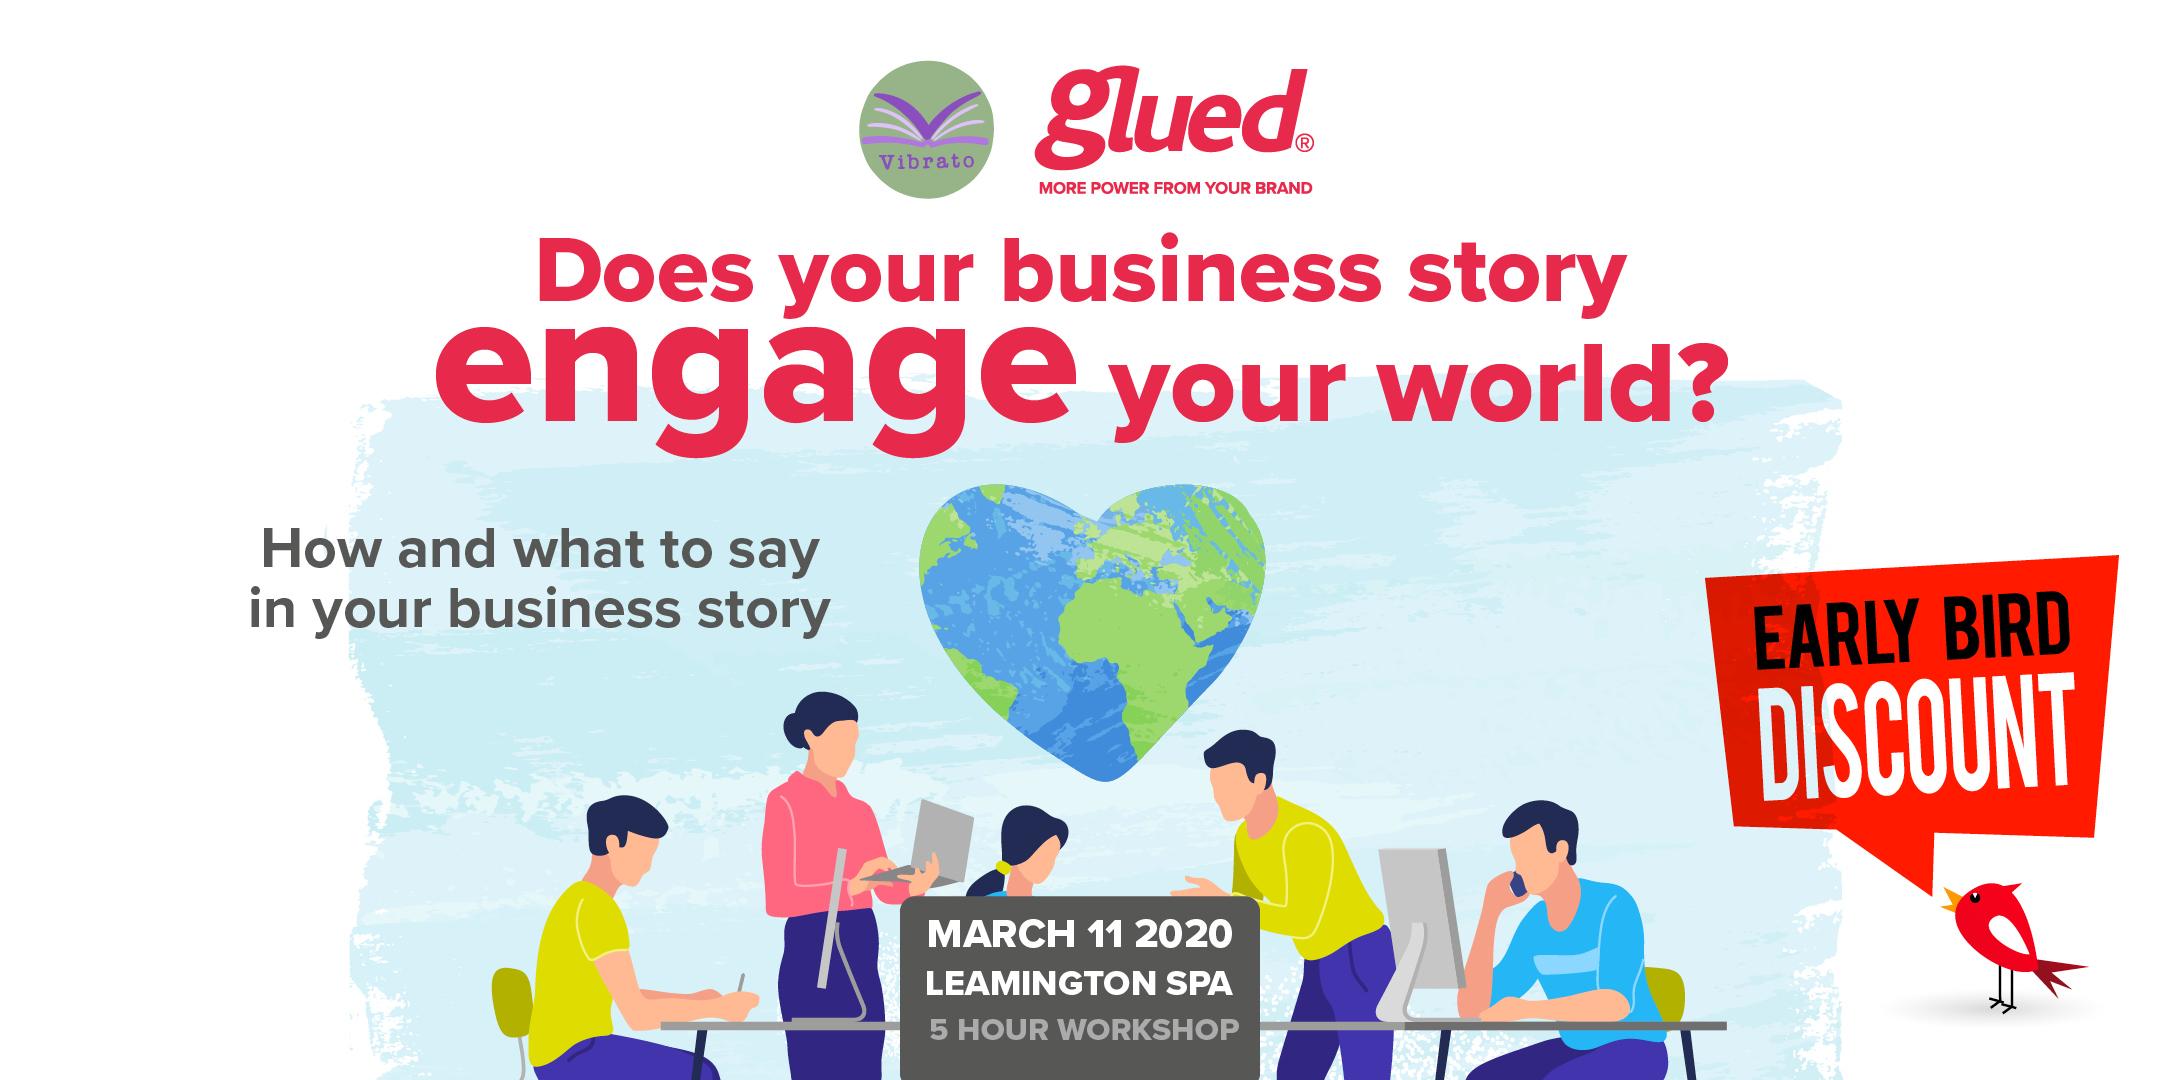 glu0823_storytelling_workshop_promo